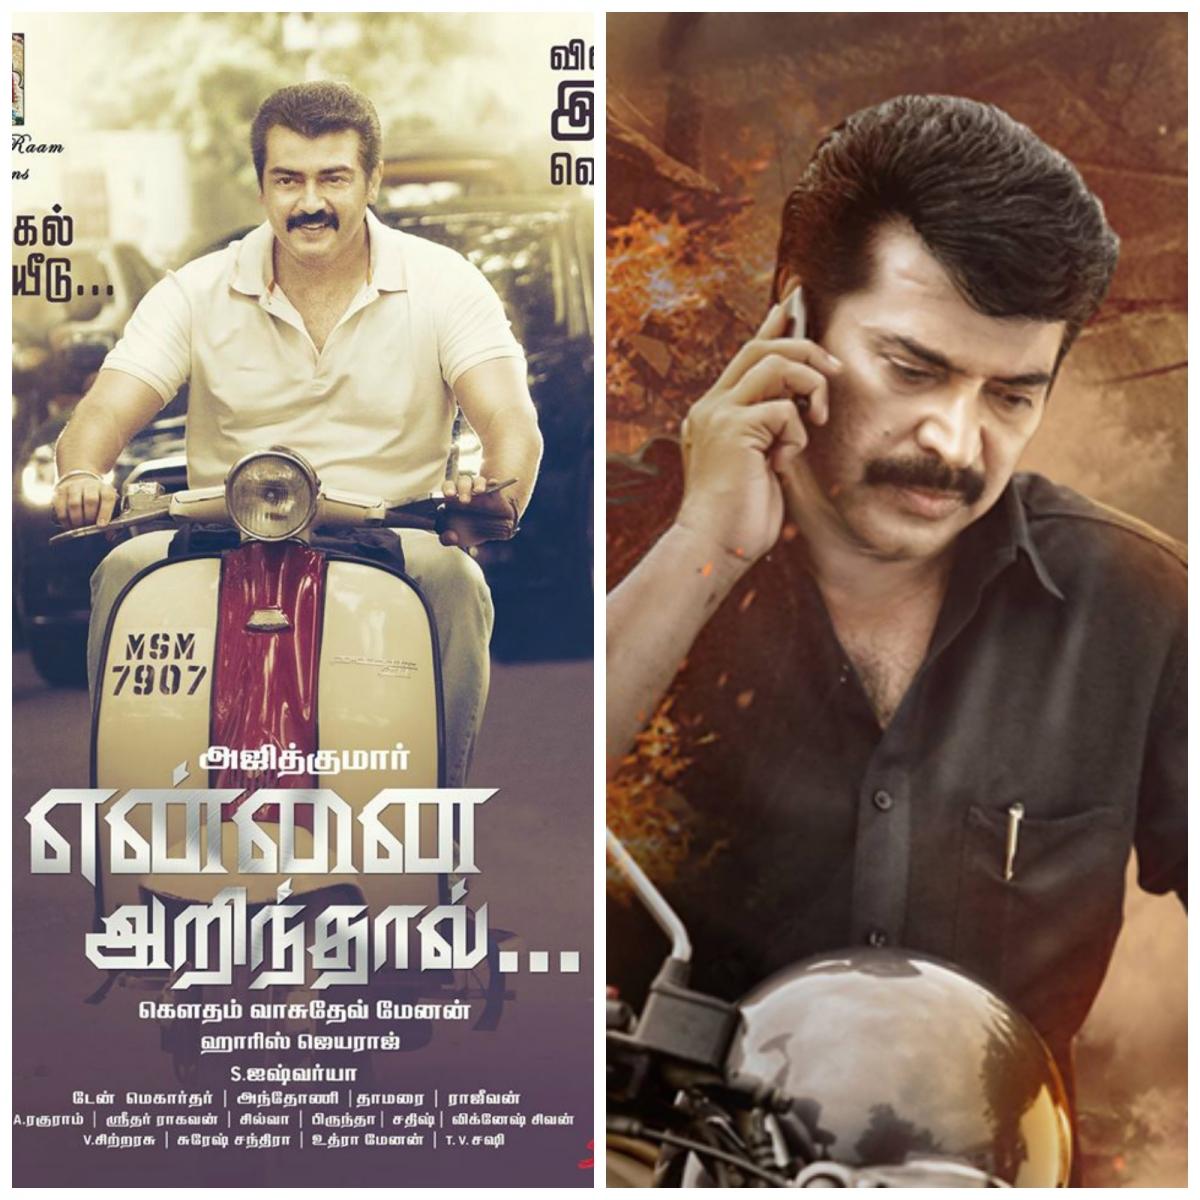 Www Ajith Com Kerala Tourism: Ajith's 'Yennai Arindhaal' Conquers Kerala; Mammootty's